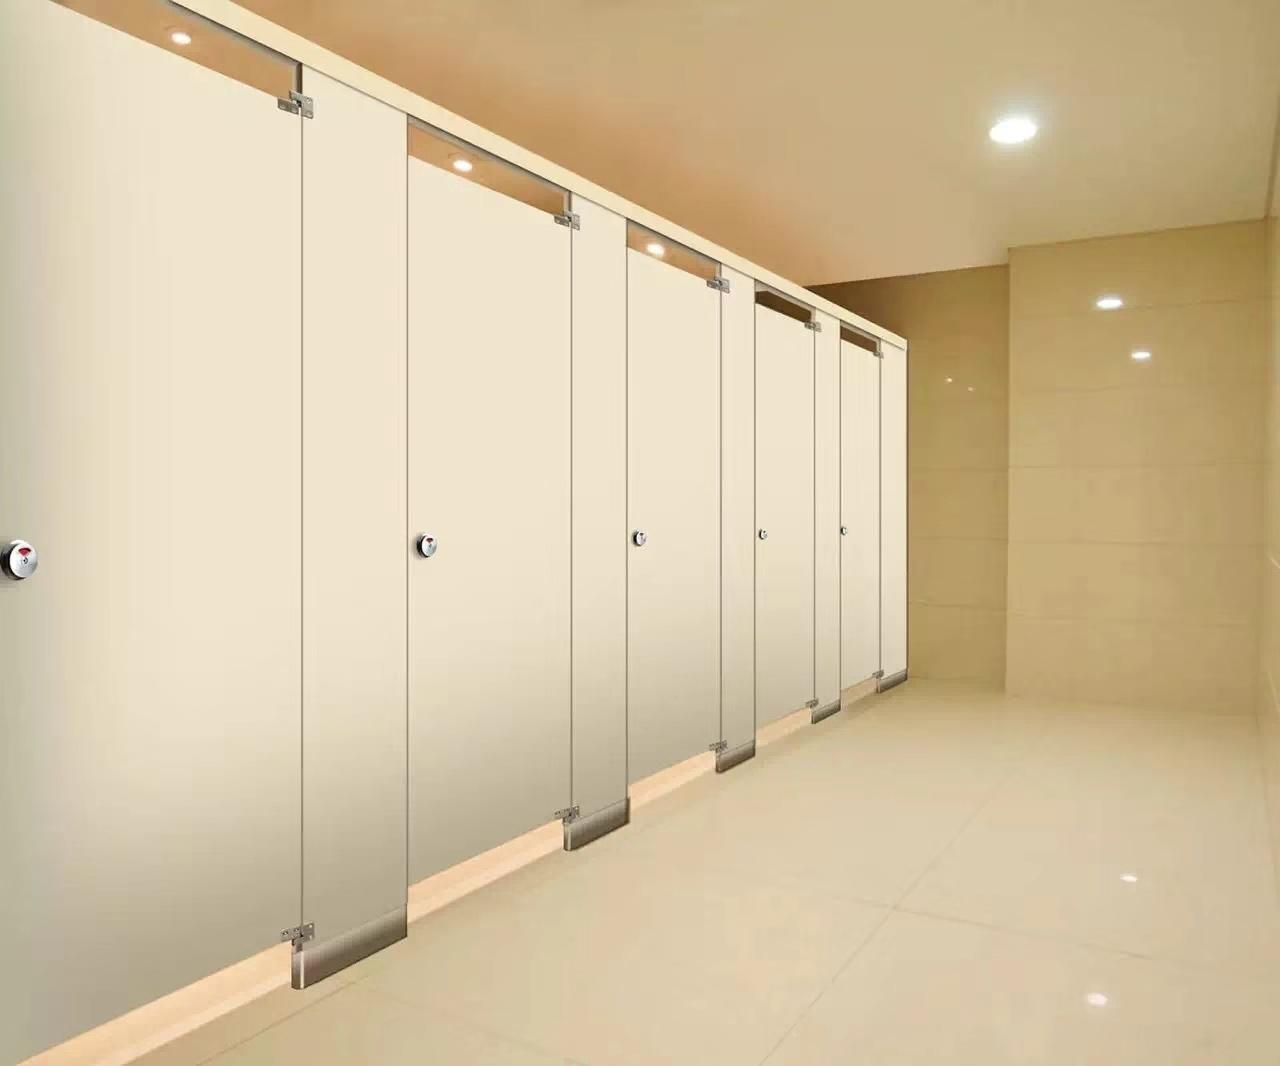 18mm铝蜂窝板批发公共卫生间隔断板材耐腐蚀金属铝蜂窝板